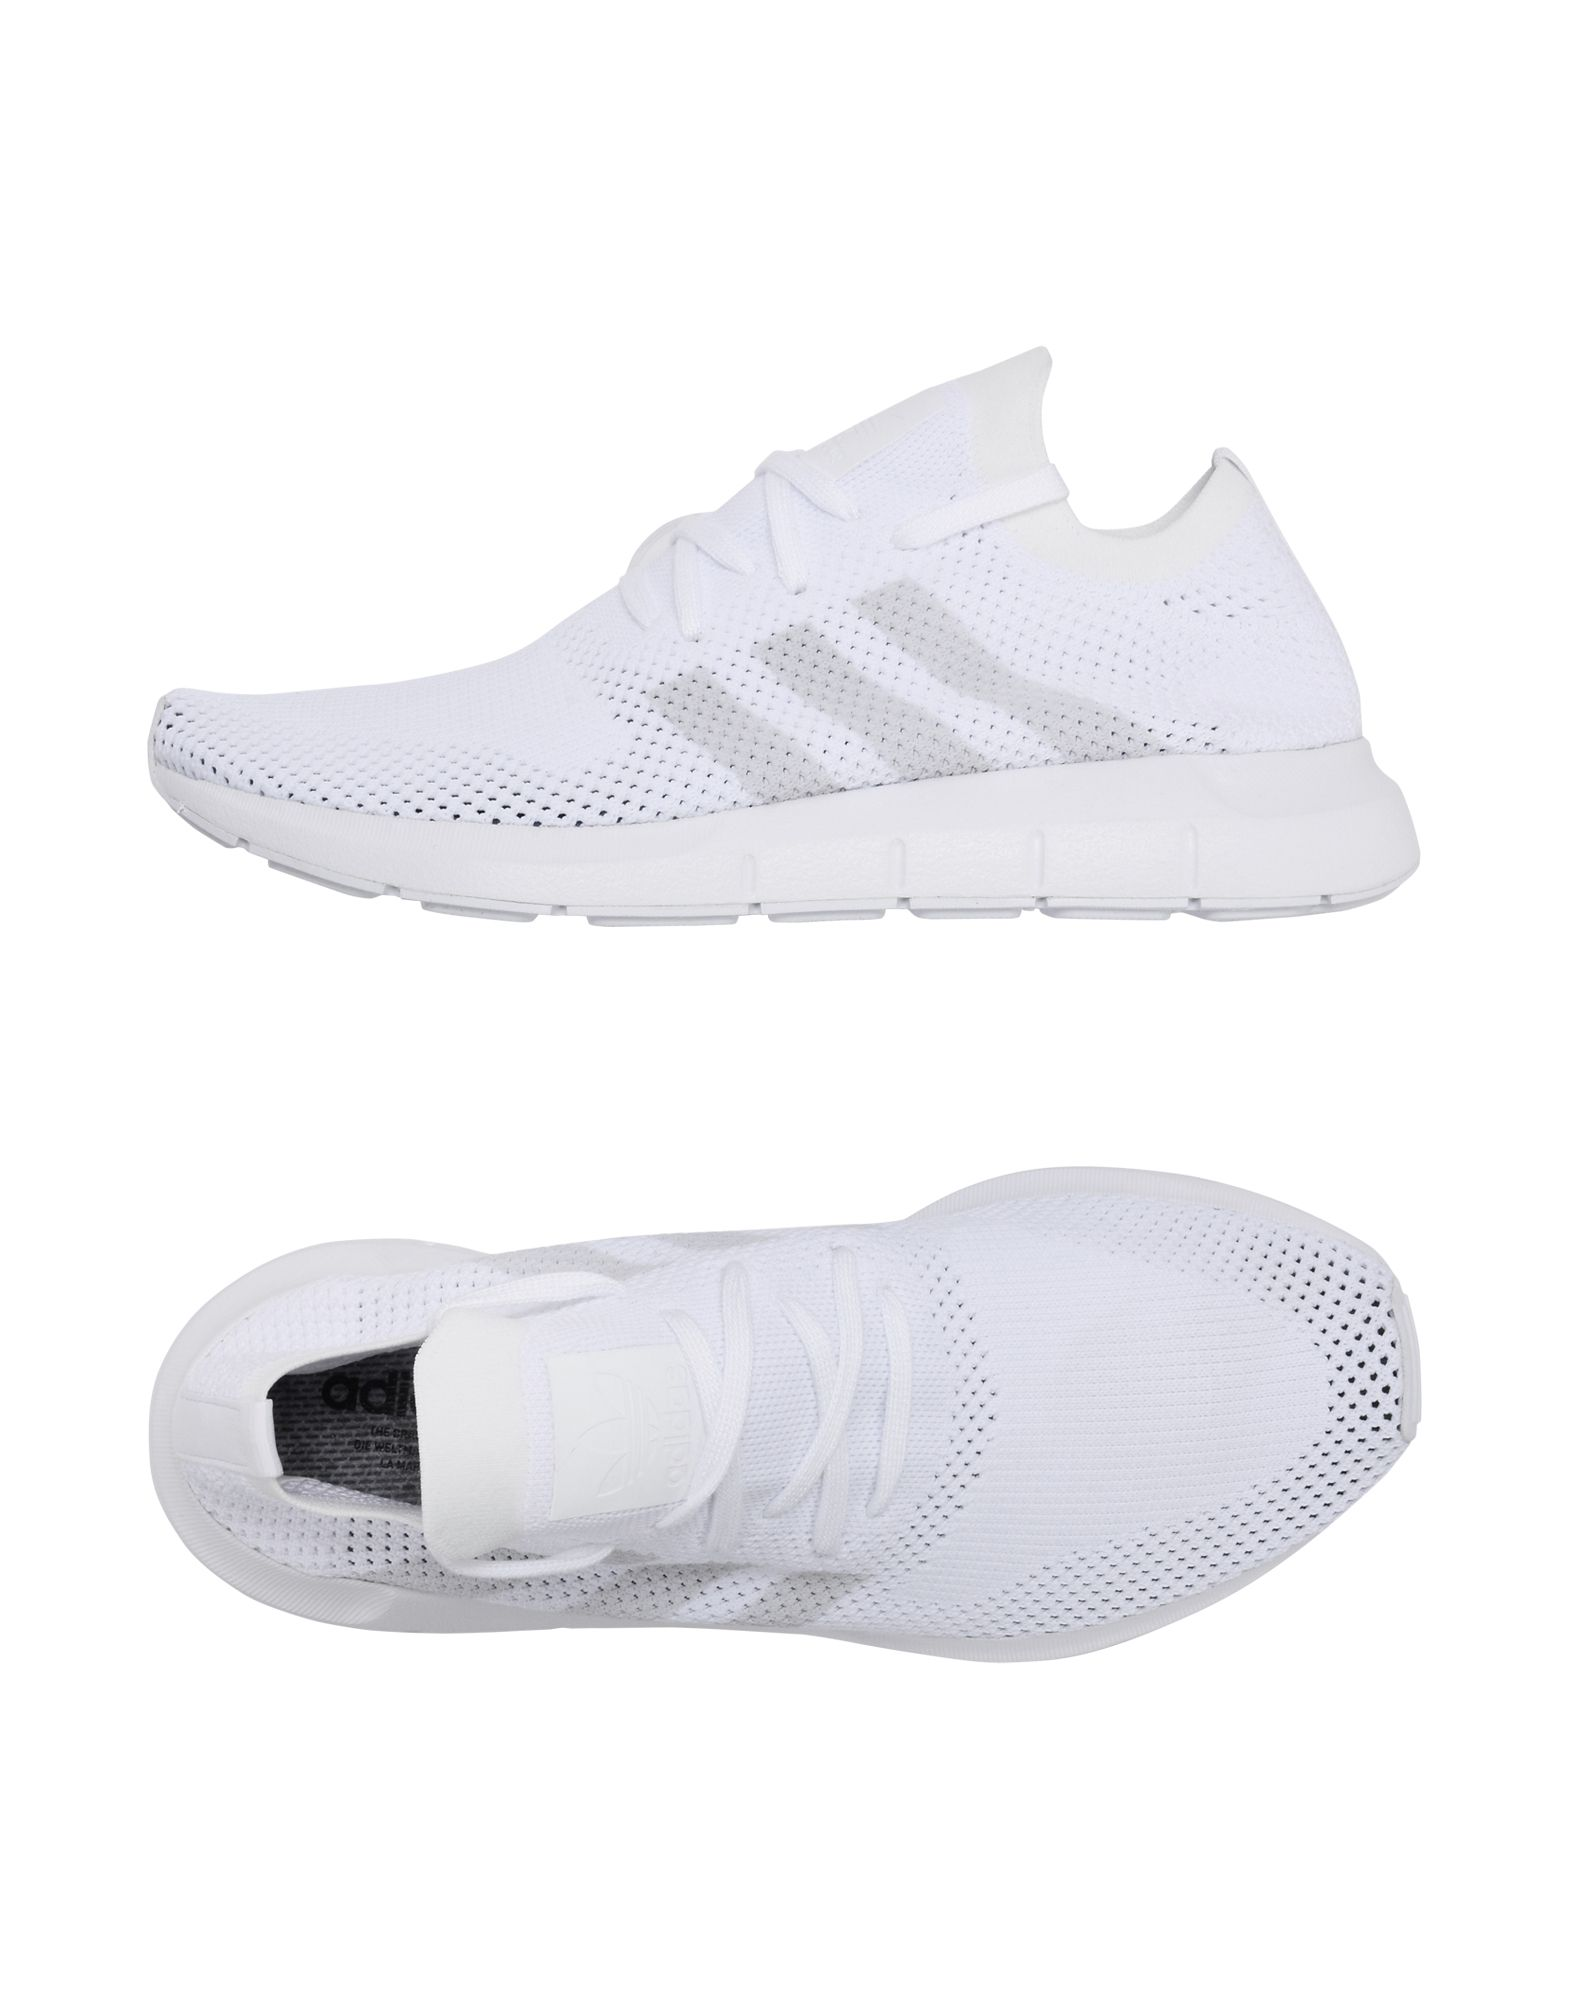 Sneakers Adidas Originals Swift Run Pk - Uomo - 11415190CA